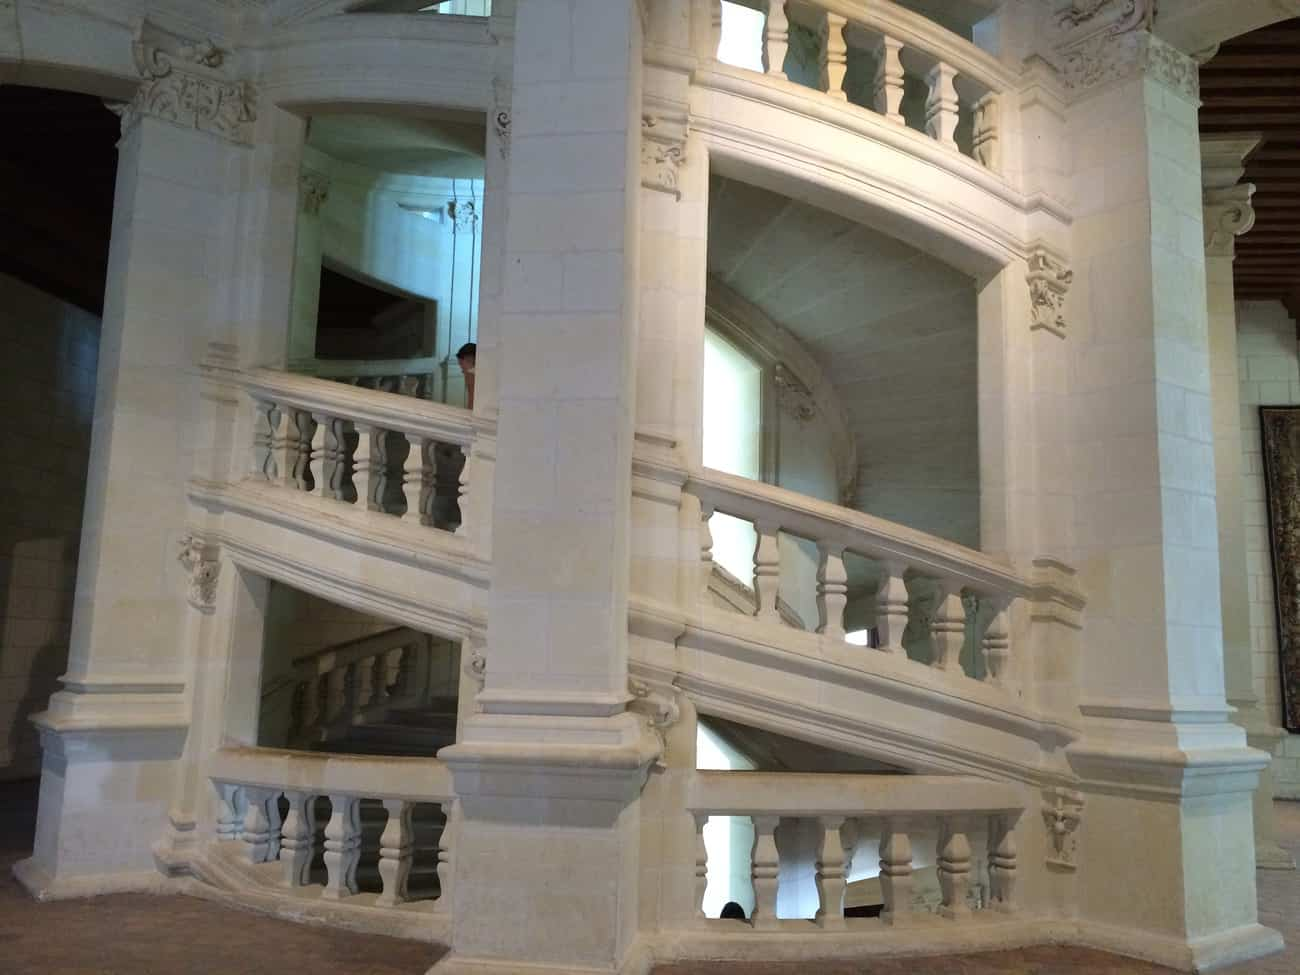 Loire - Chateau de Chambord staircase